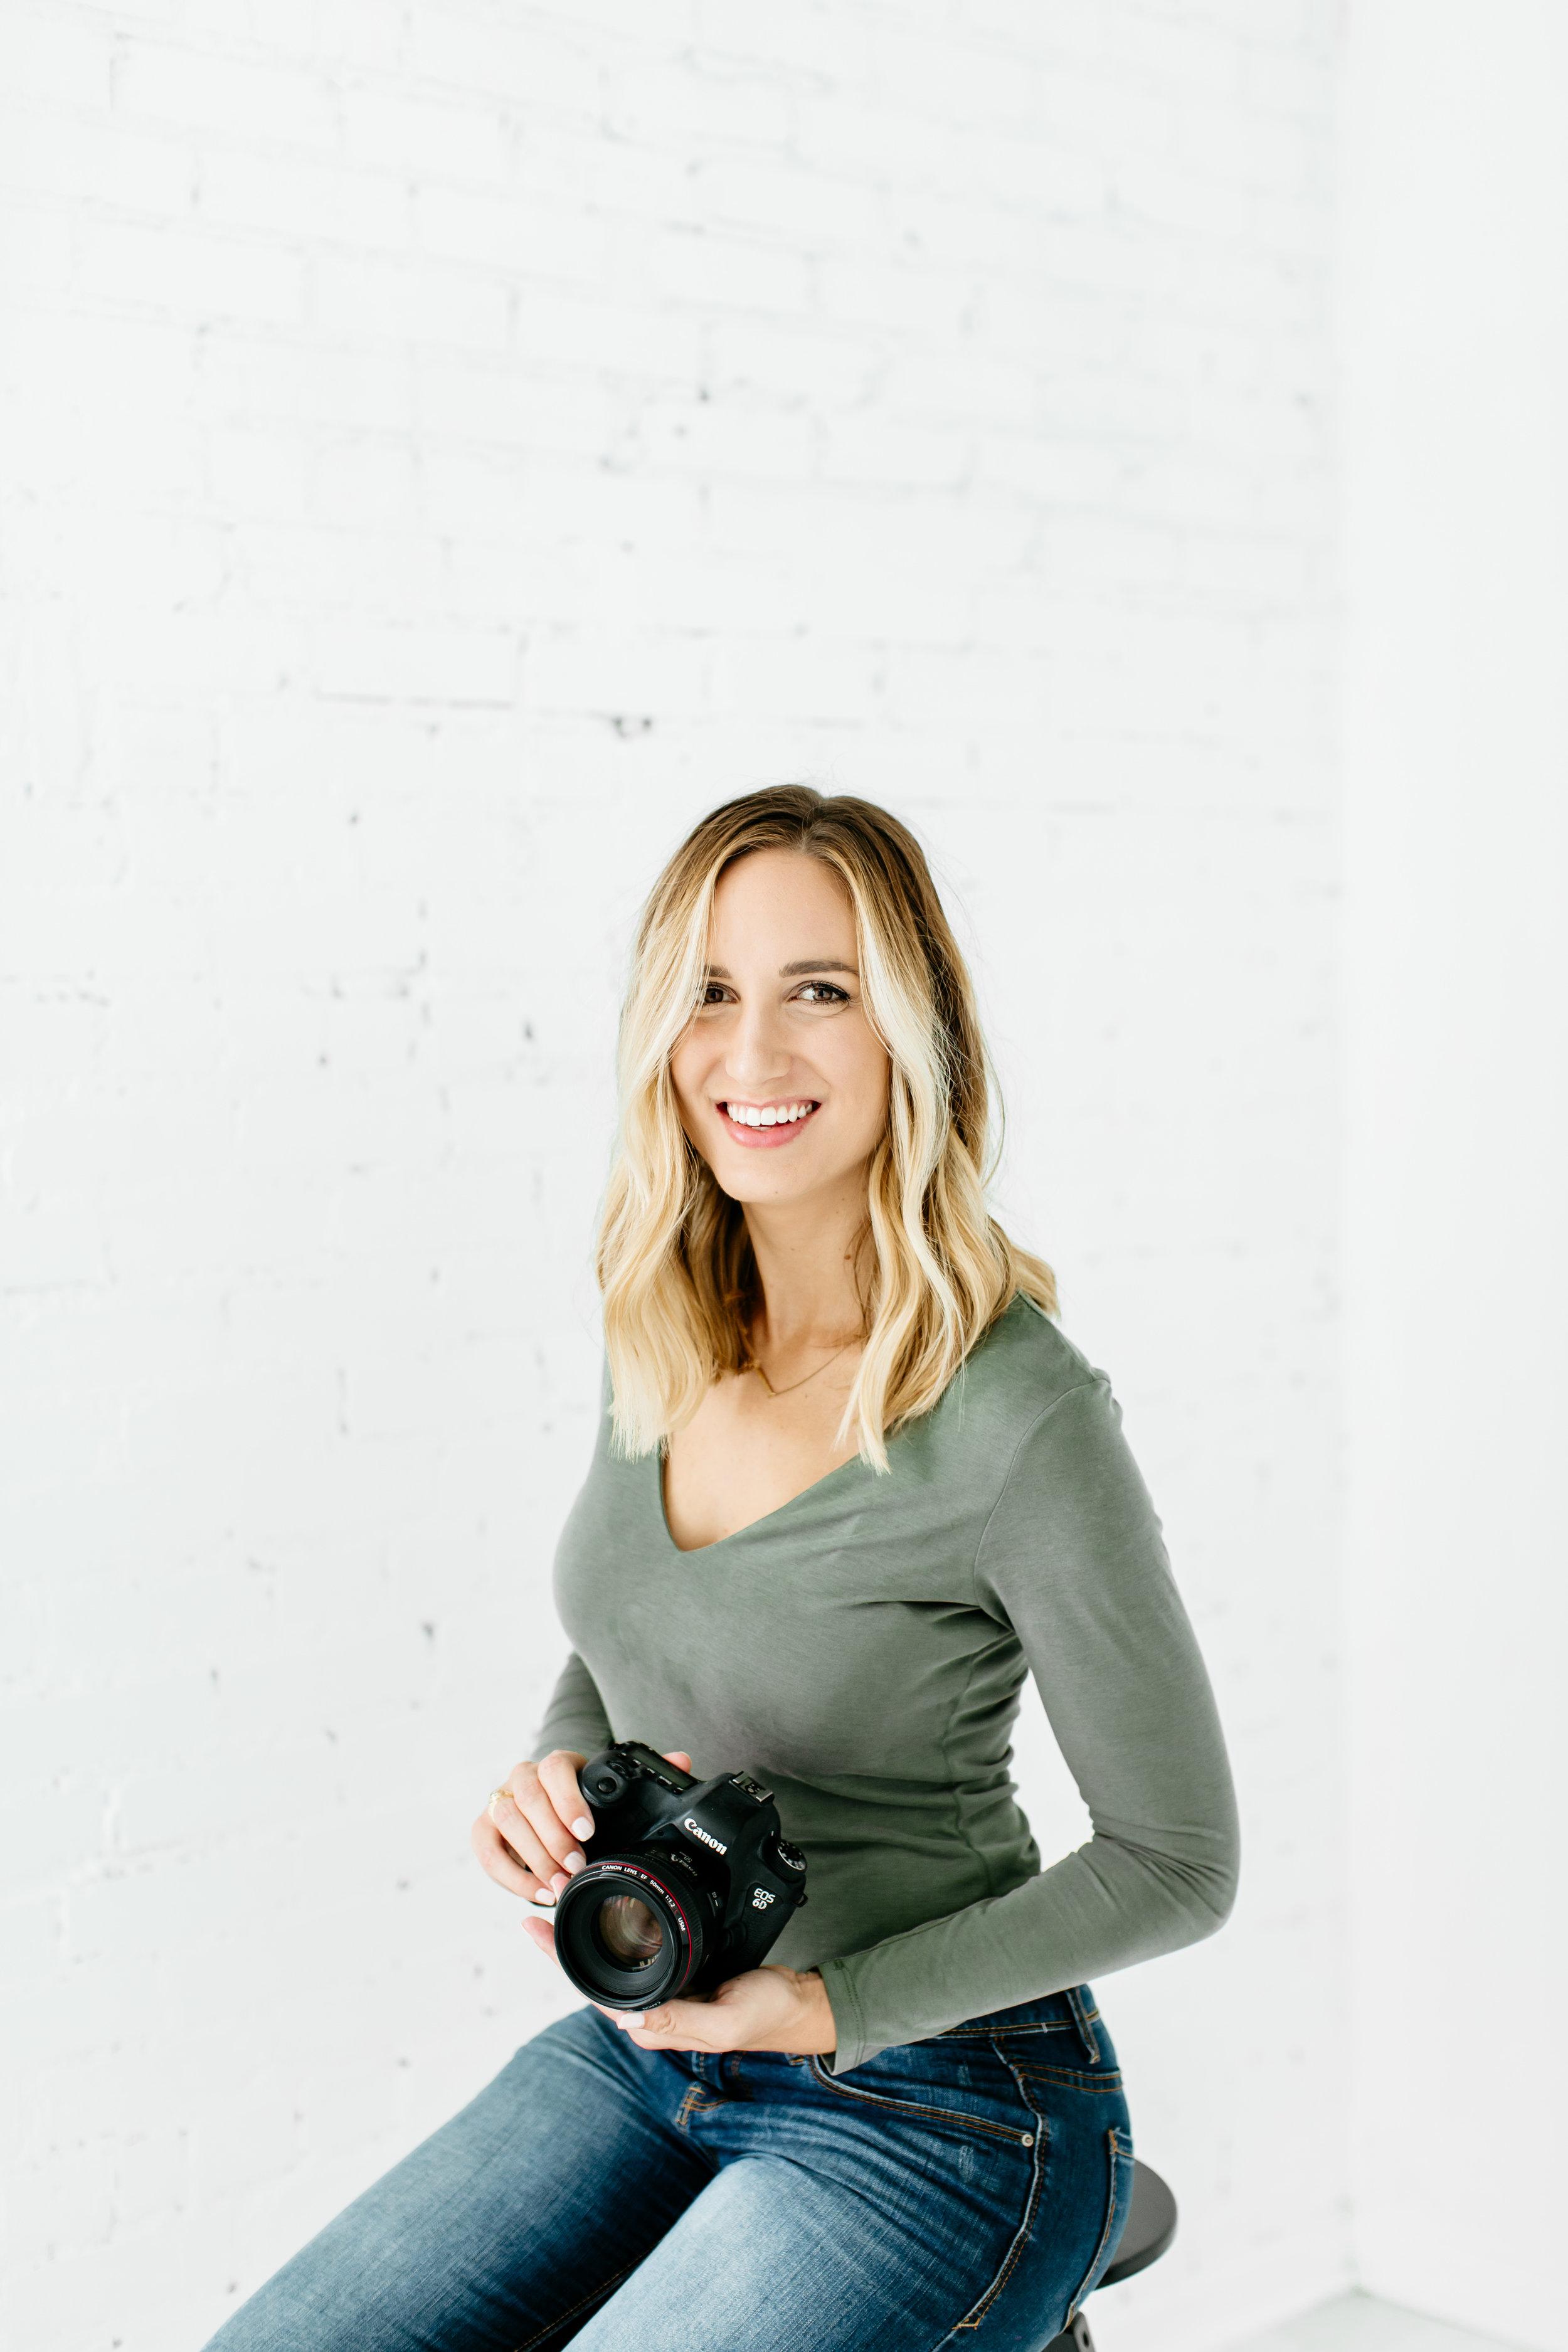 Alexa-Vossler-Photo_Dallas-Headshot-Photographer_Headshots-at-The-Lumen-Room_Kaitlyn-16.jpg